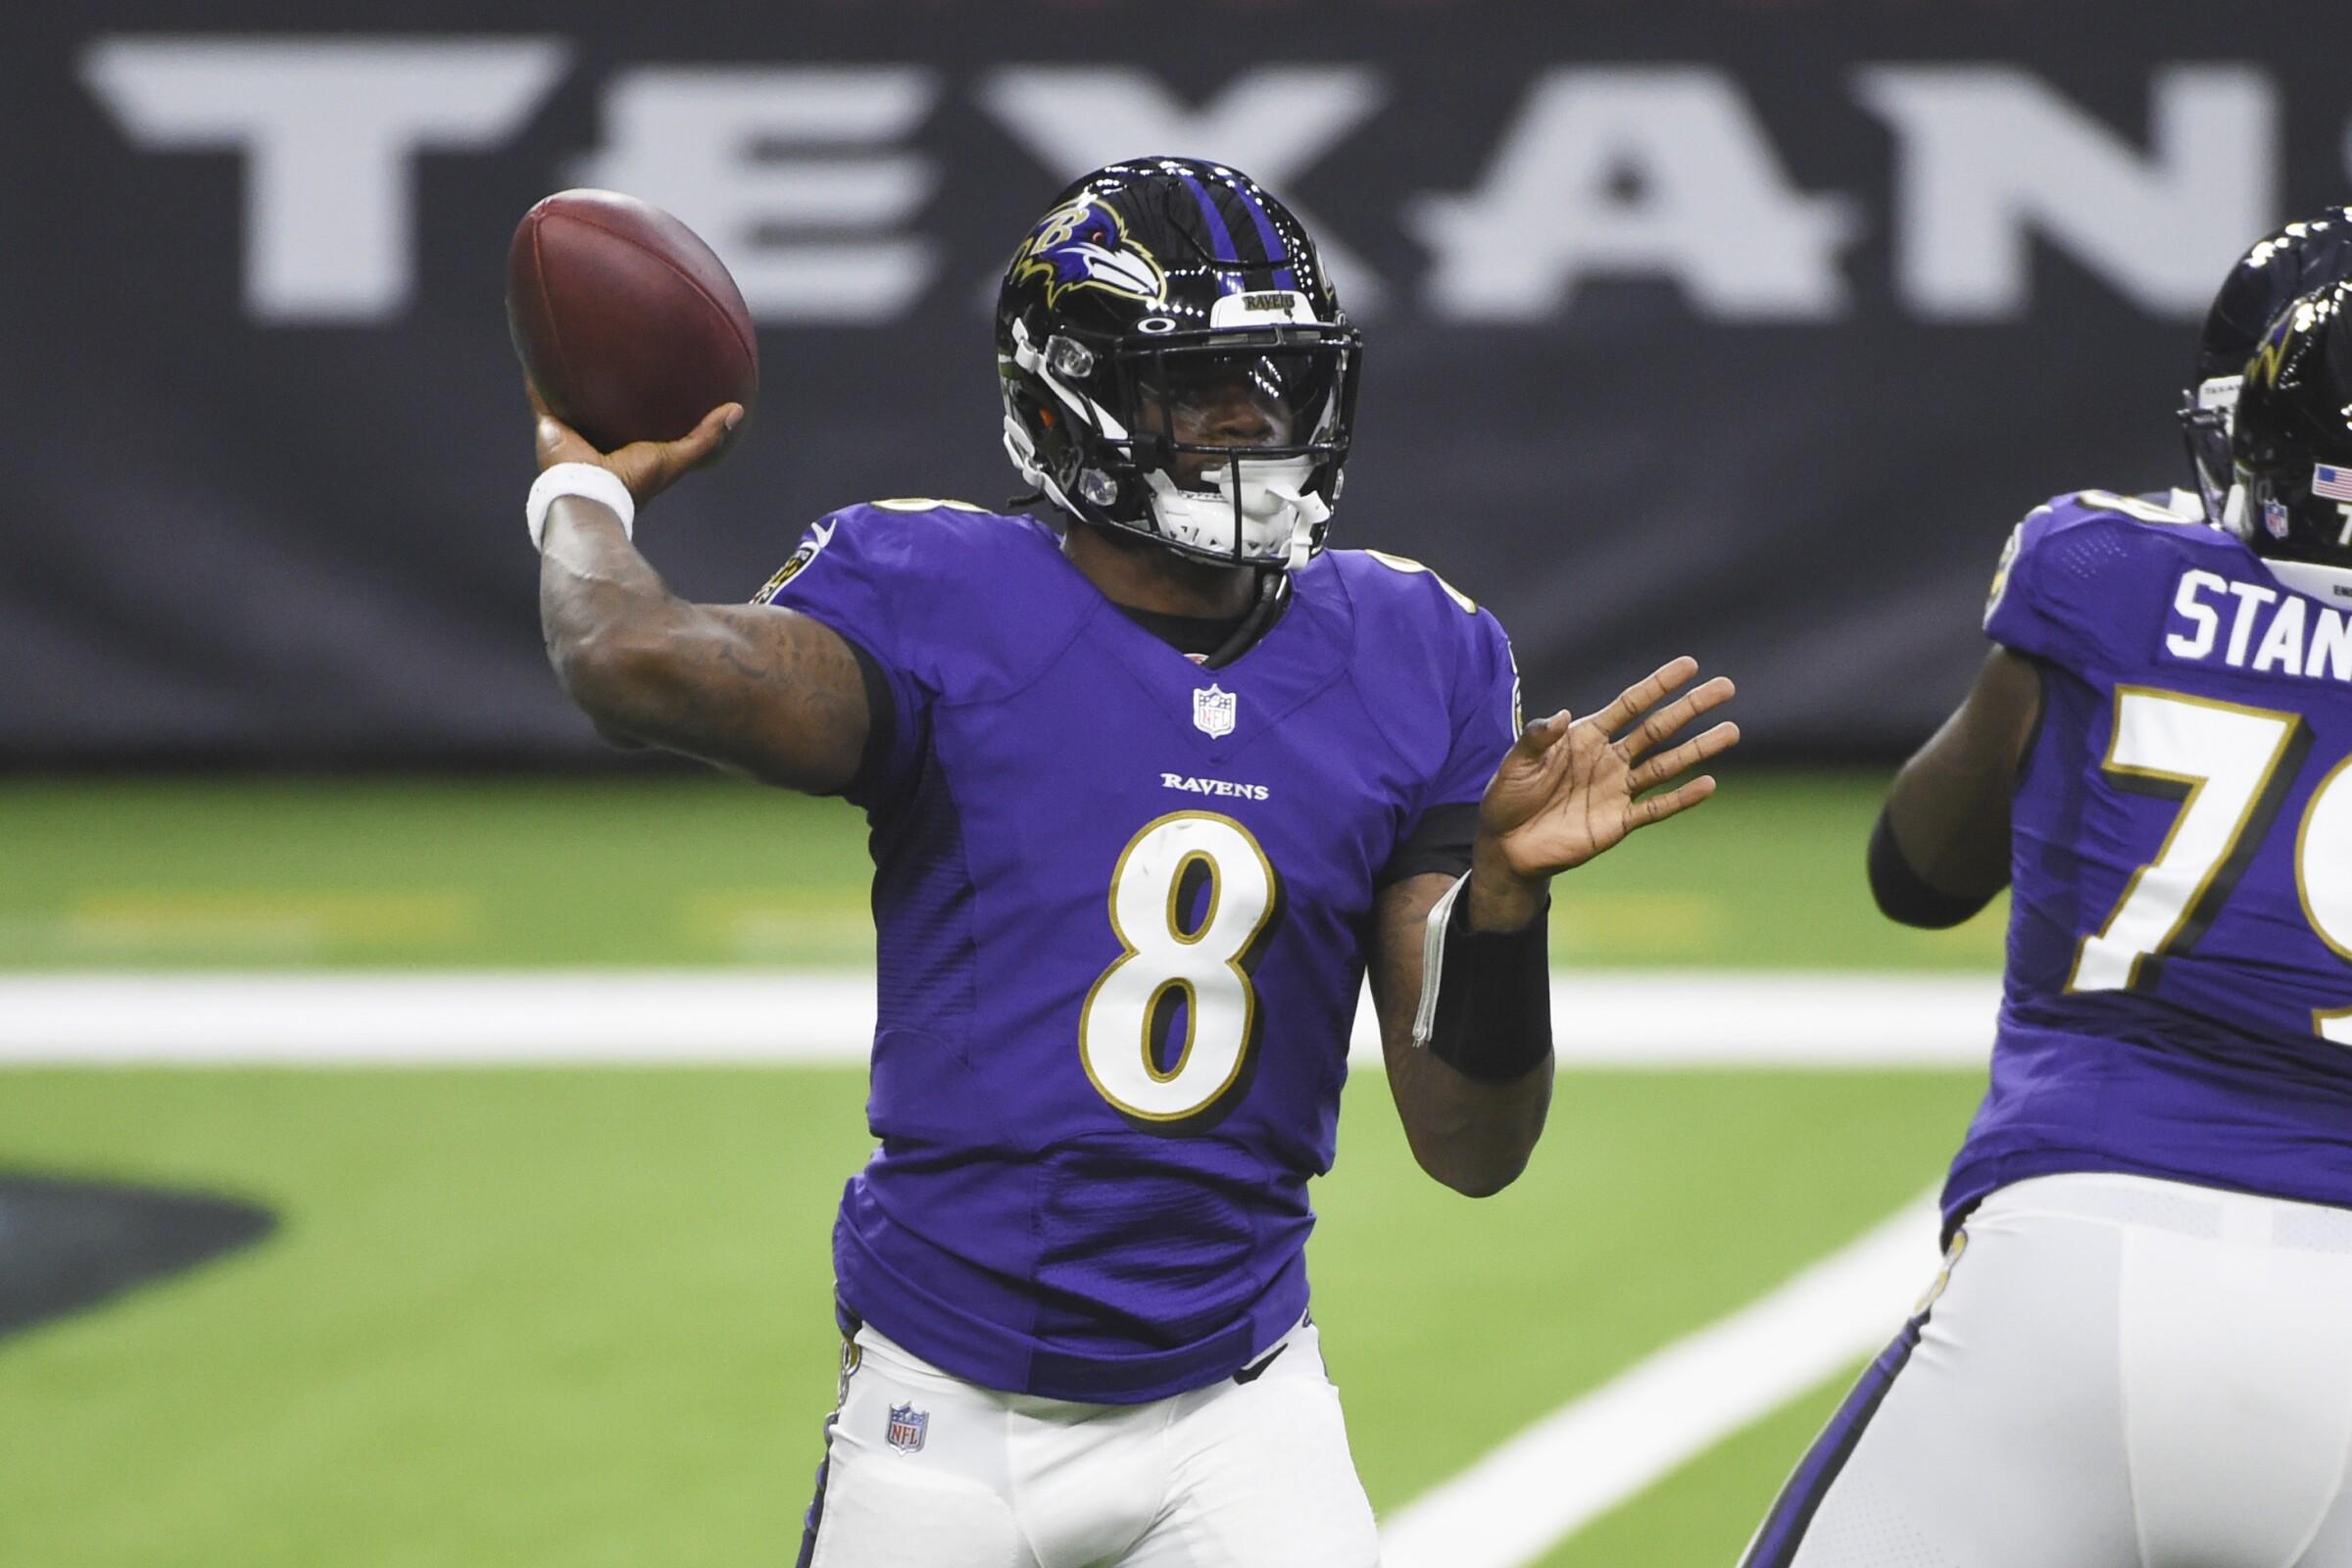 Baltimore Ravens quarterback Lamar Jackson throws during a win over the Houston Texans.